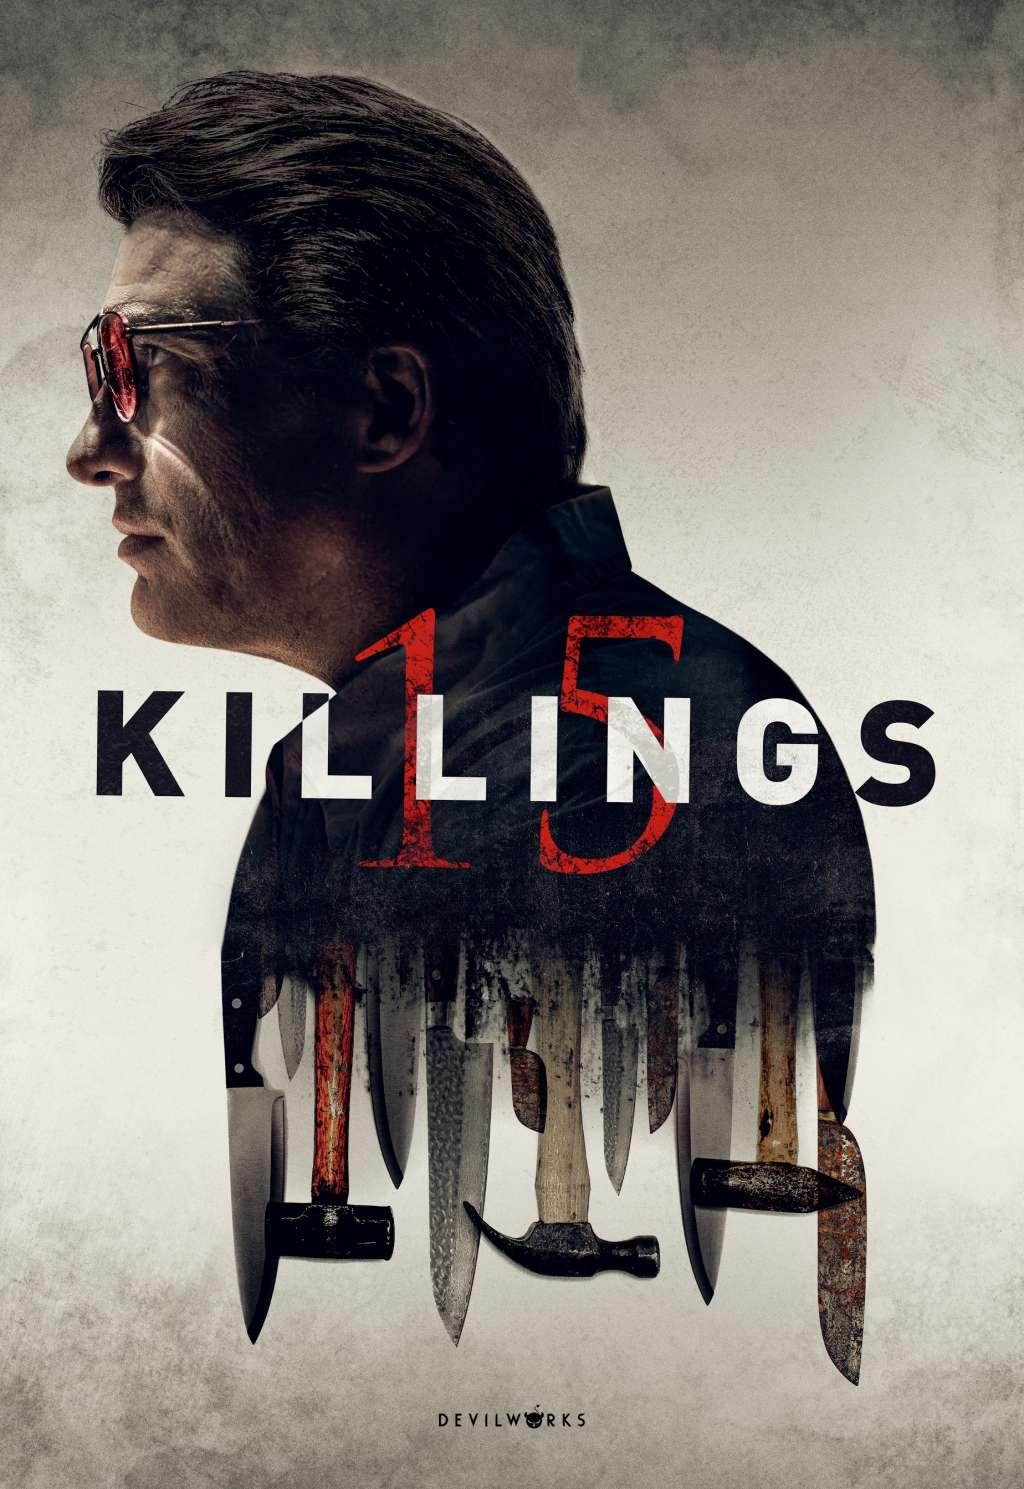 15 Killings kapak